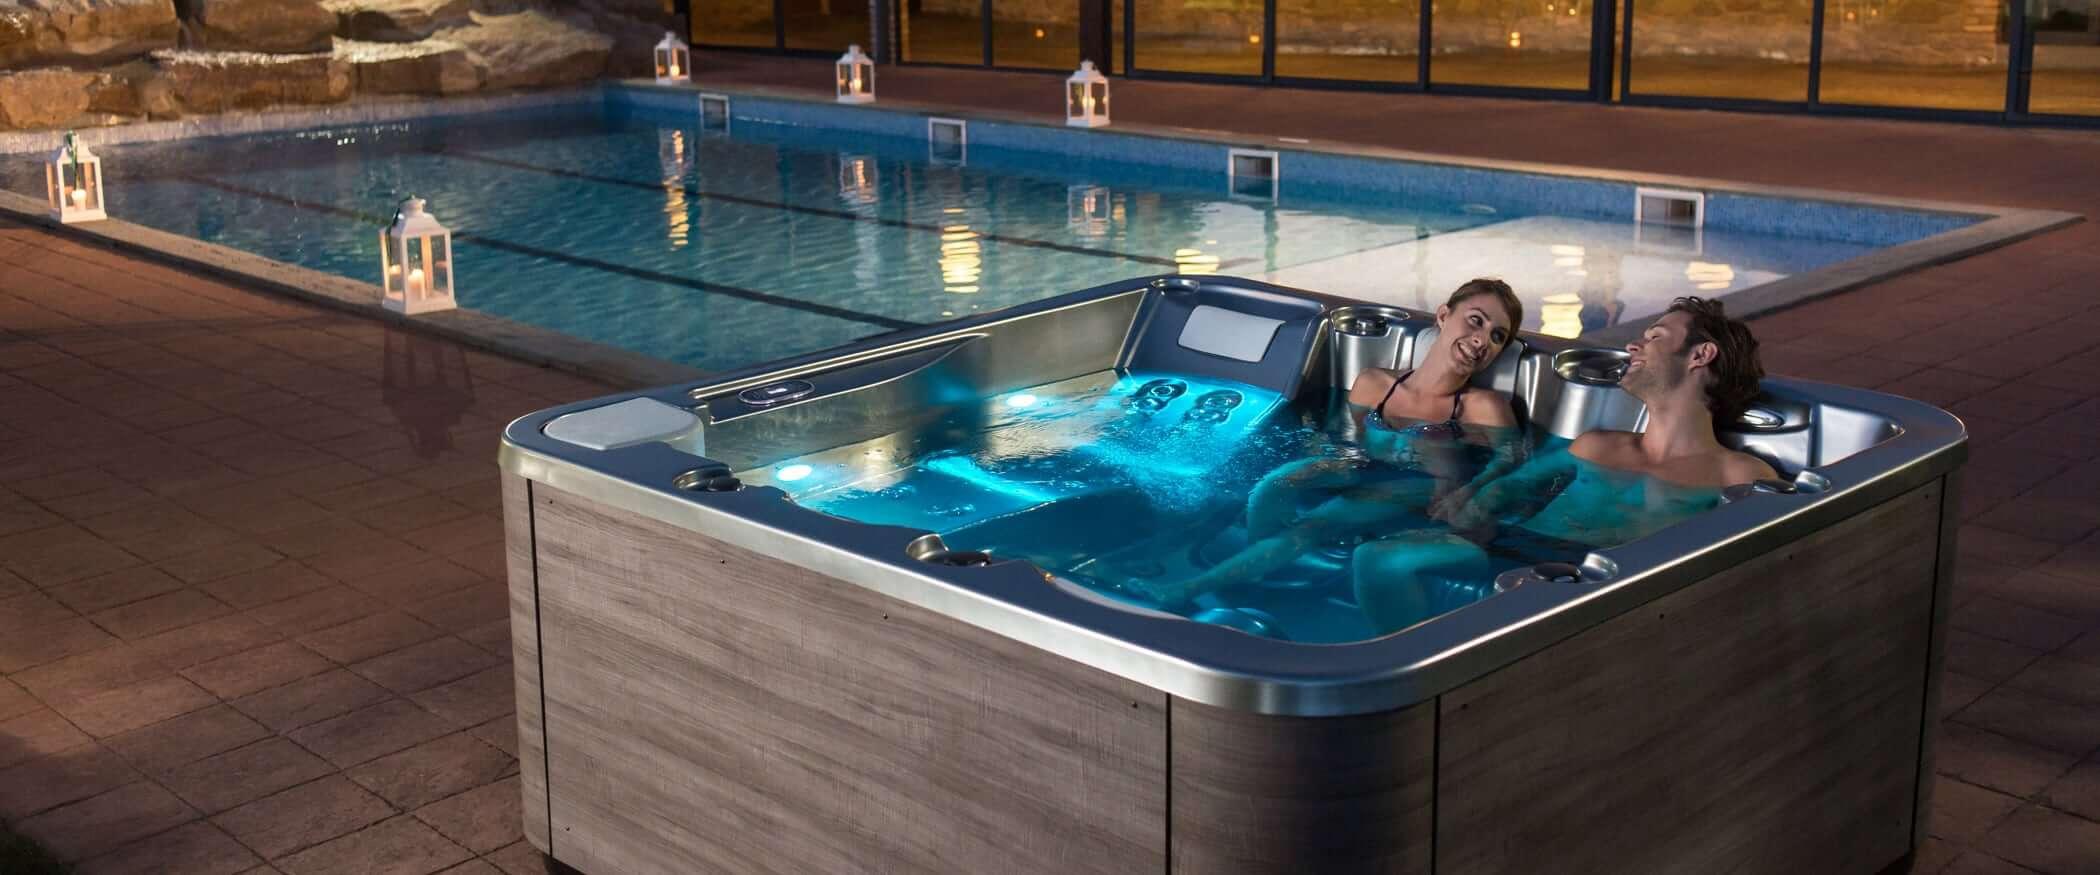 Buy the Premium hot tub Nice - Aquavia Spa UK